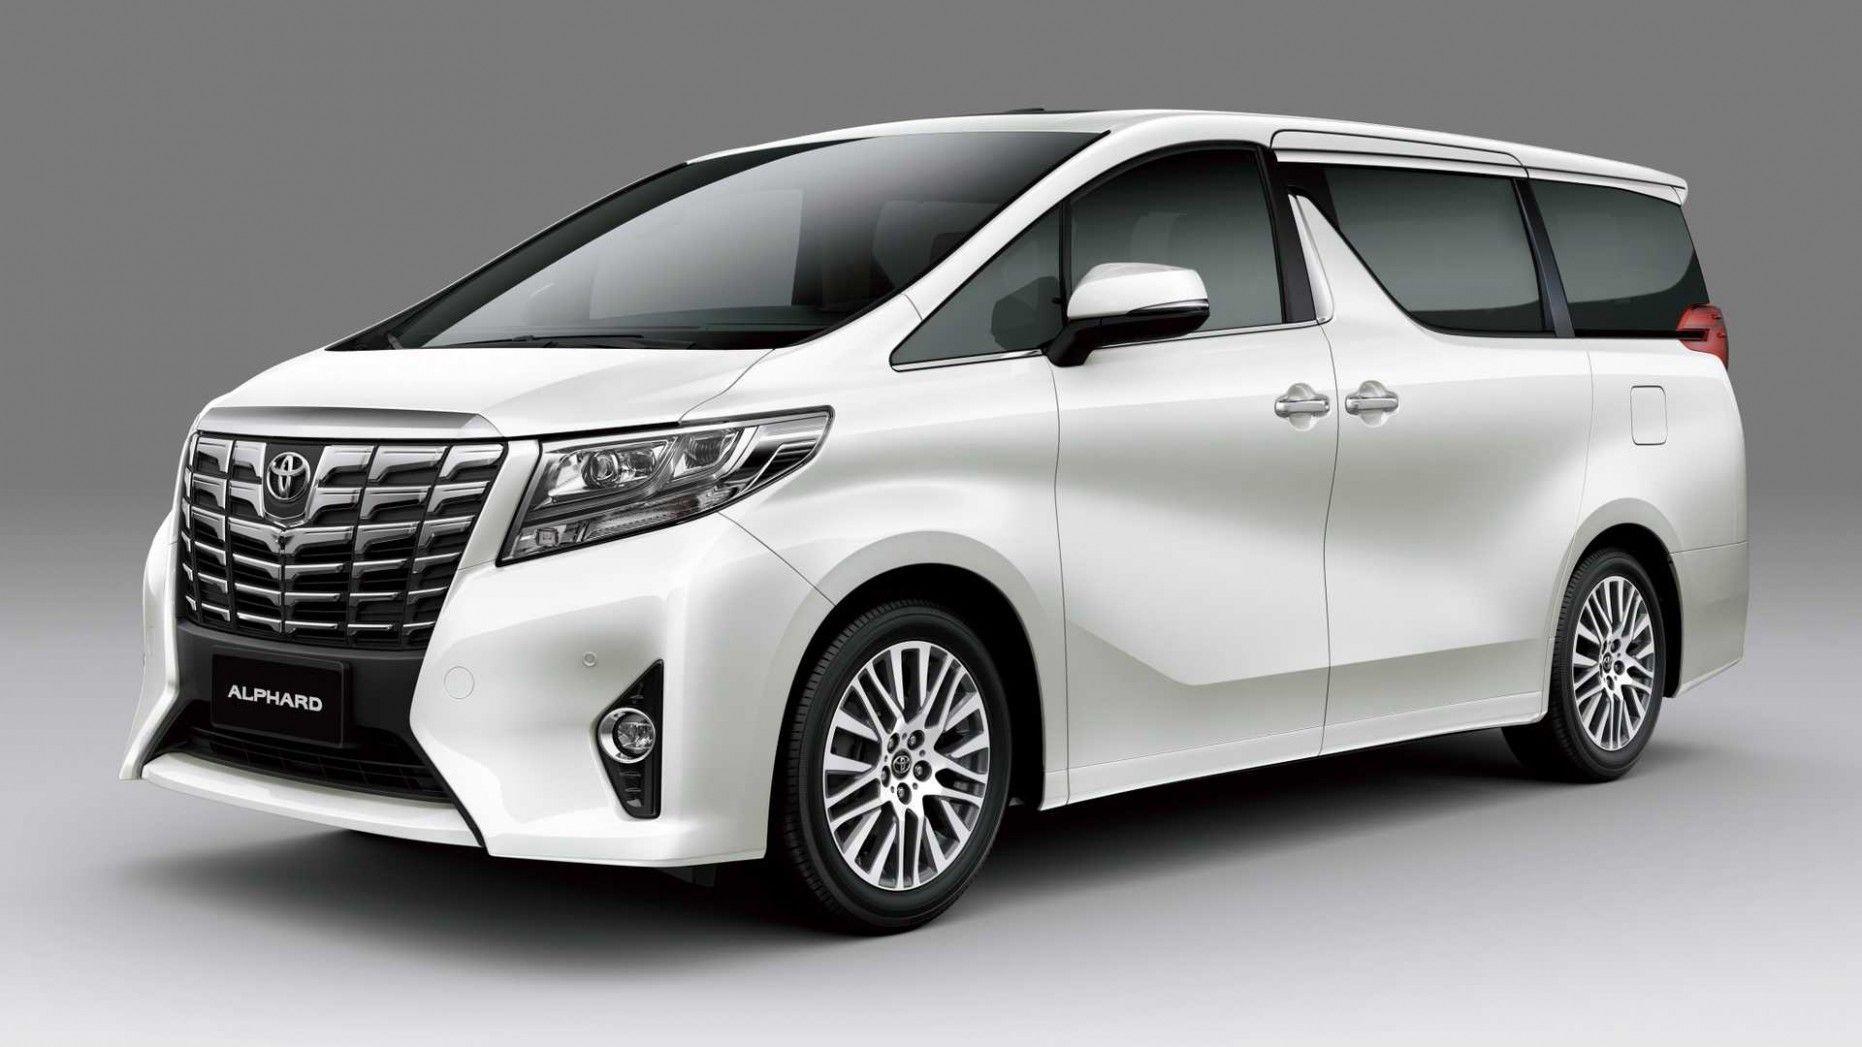 2021 Toyota Alphard Specs Di 2021 Mobil Toyota Bahan Bakar